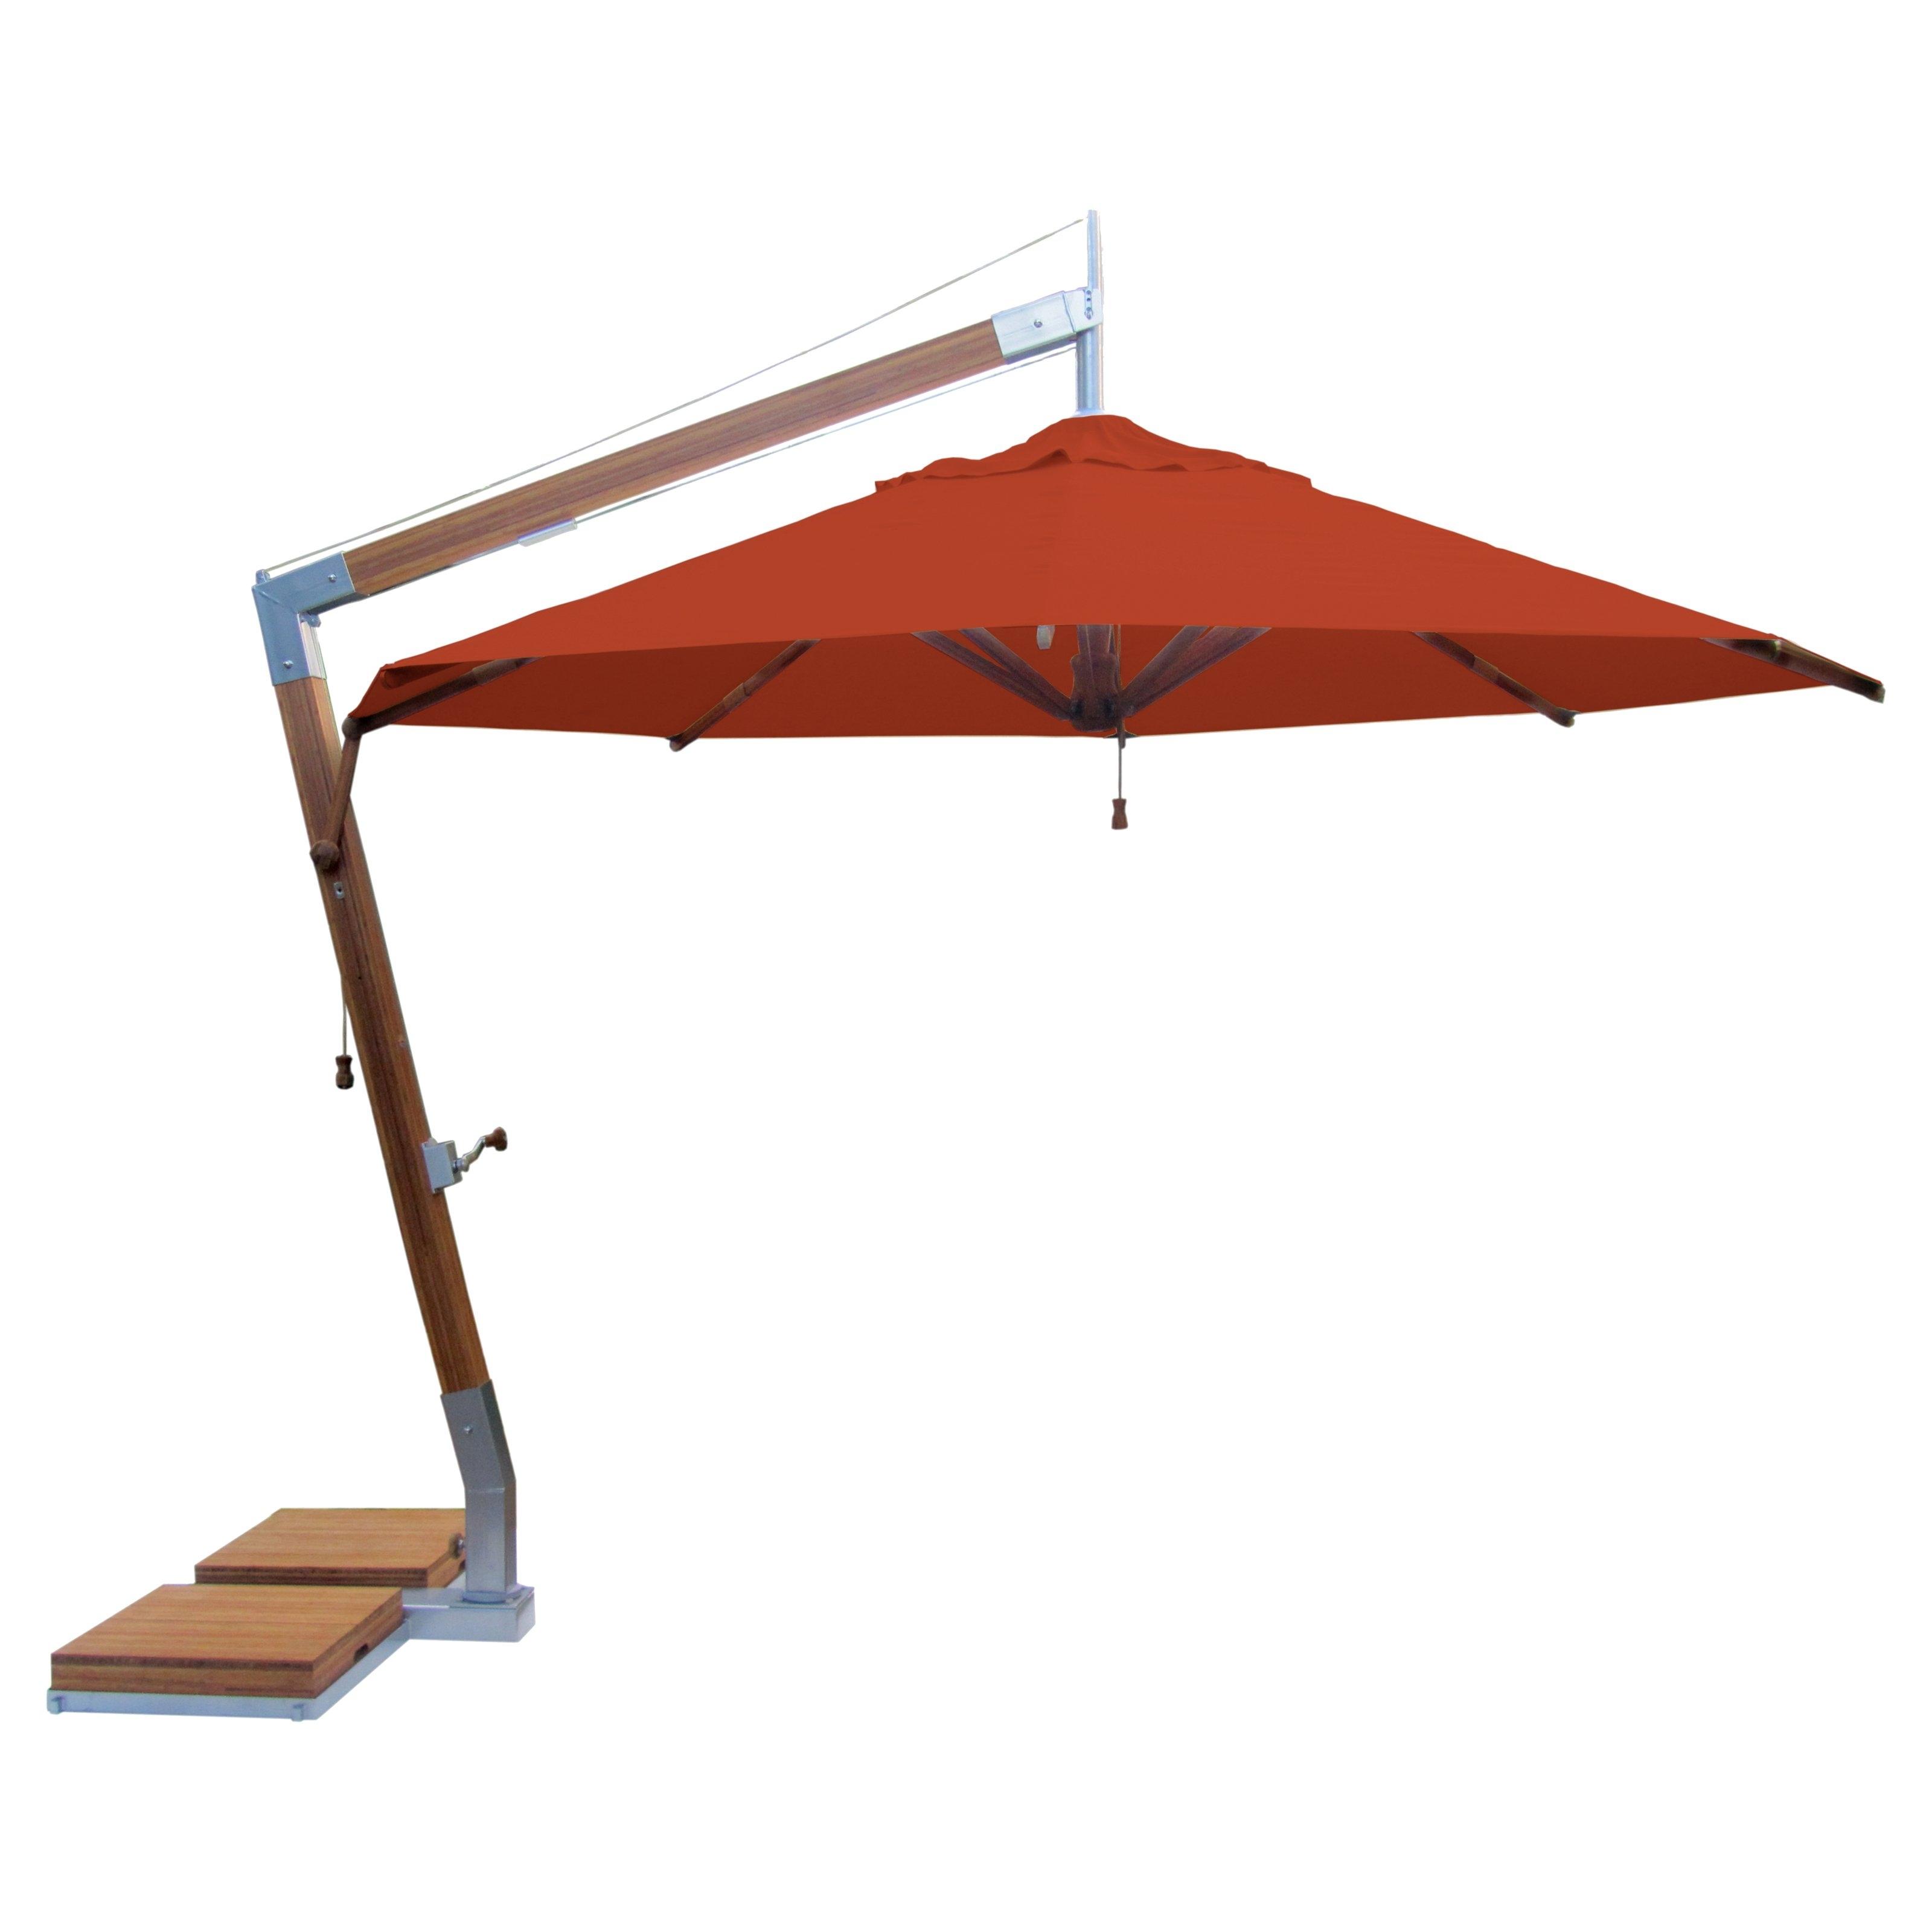 Offset Cantilever Patio Umbrellas For Trendy Furniture: Contemporary Patio Orange Offset Patio Umbrellas At Hayneedle (View 13 of 20)